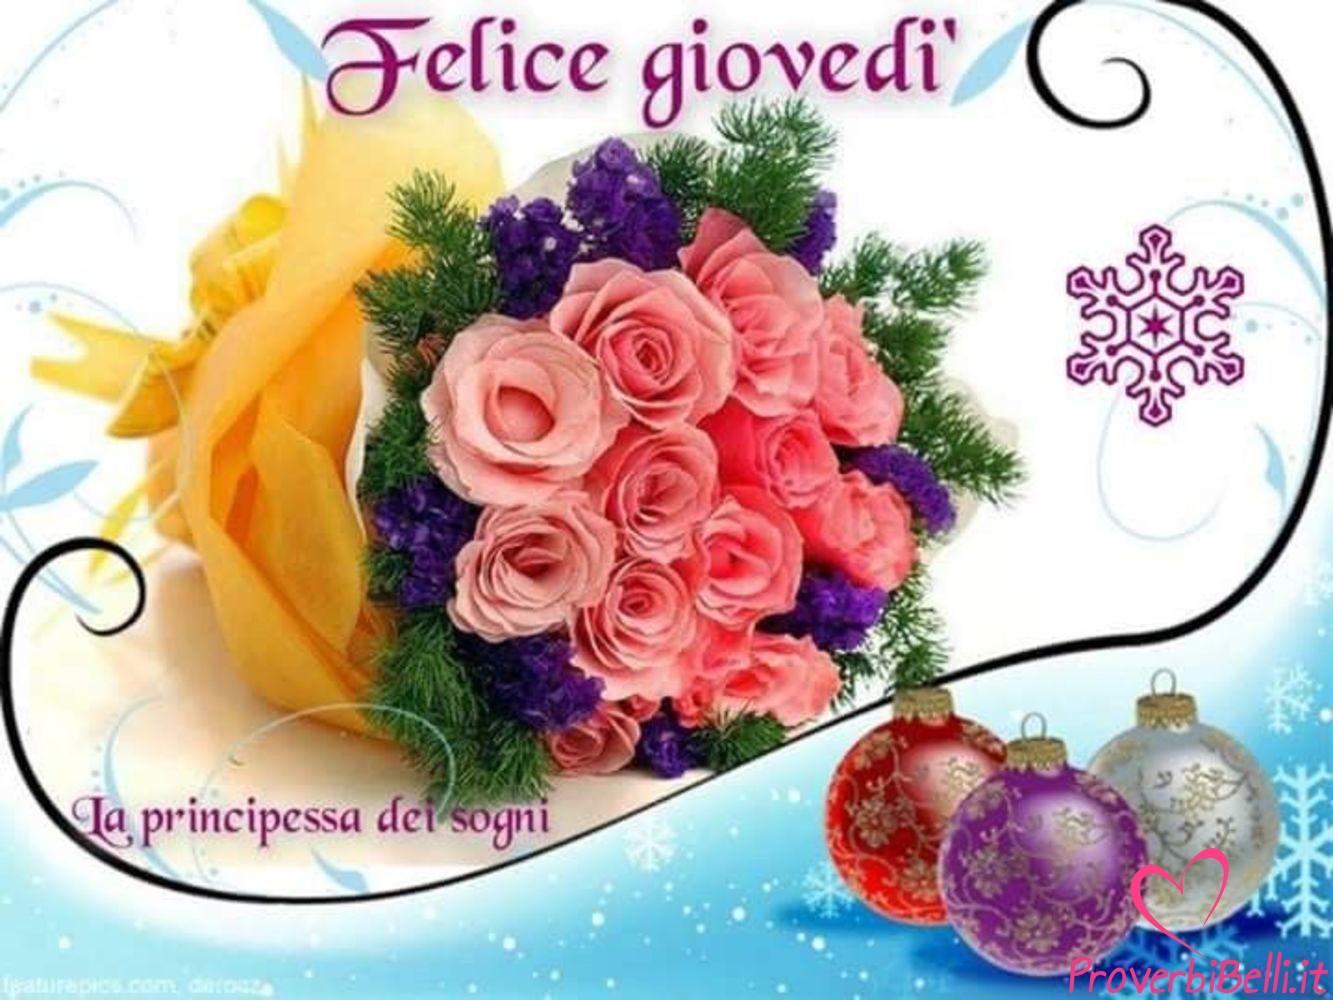 Giovedì-Immagini-Foto-per-Facebook-Whatsapp-94